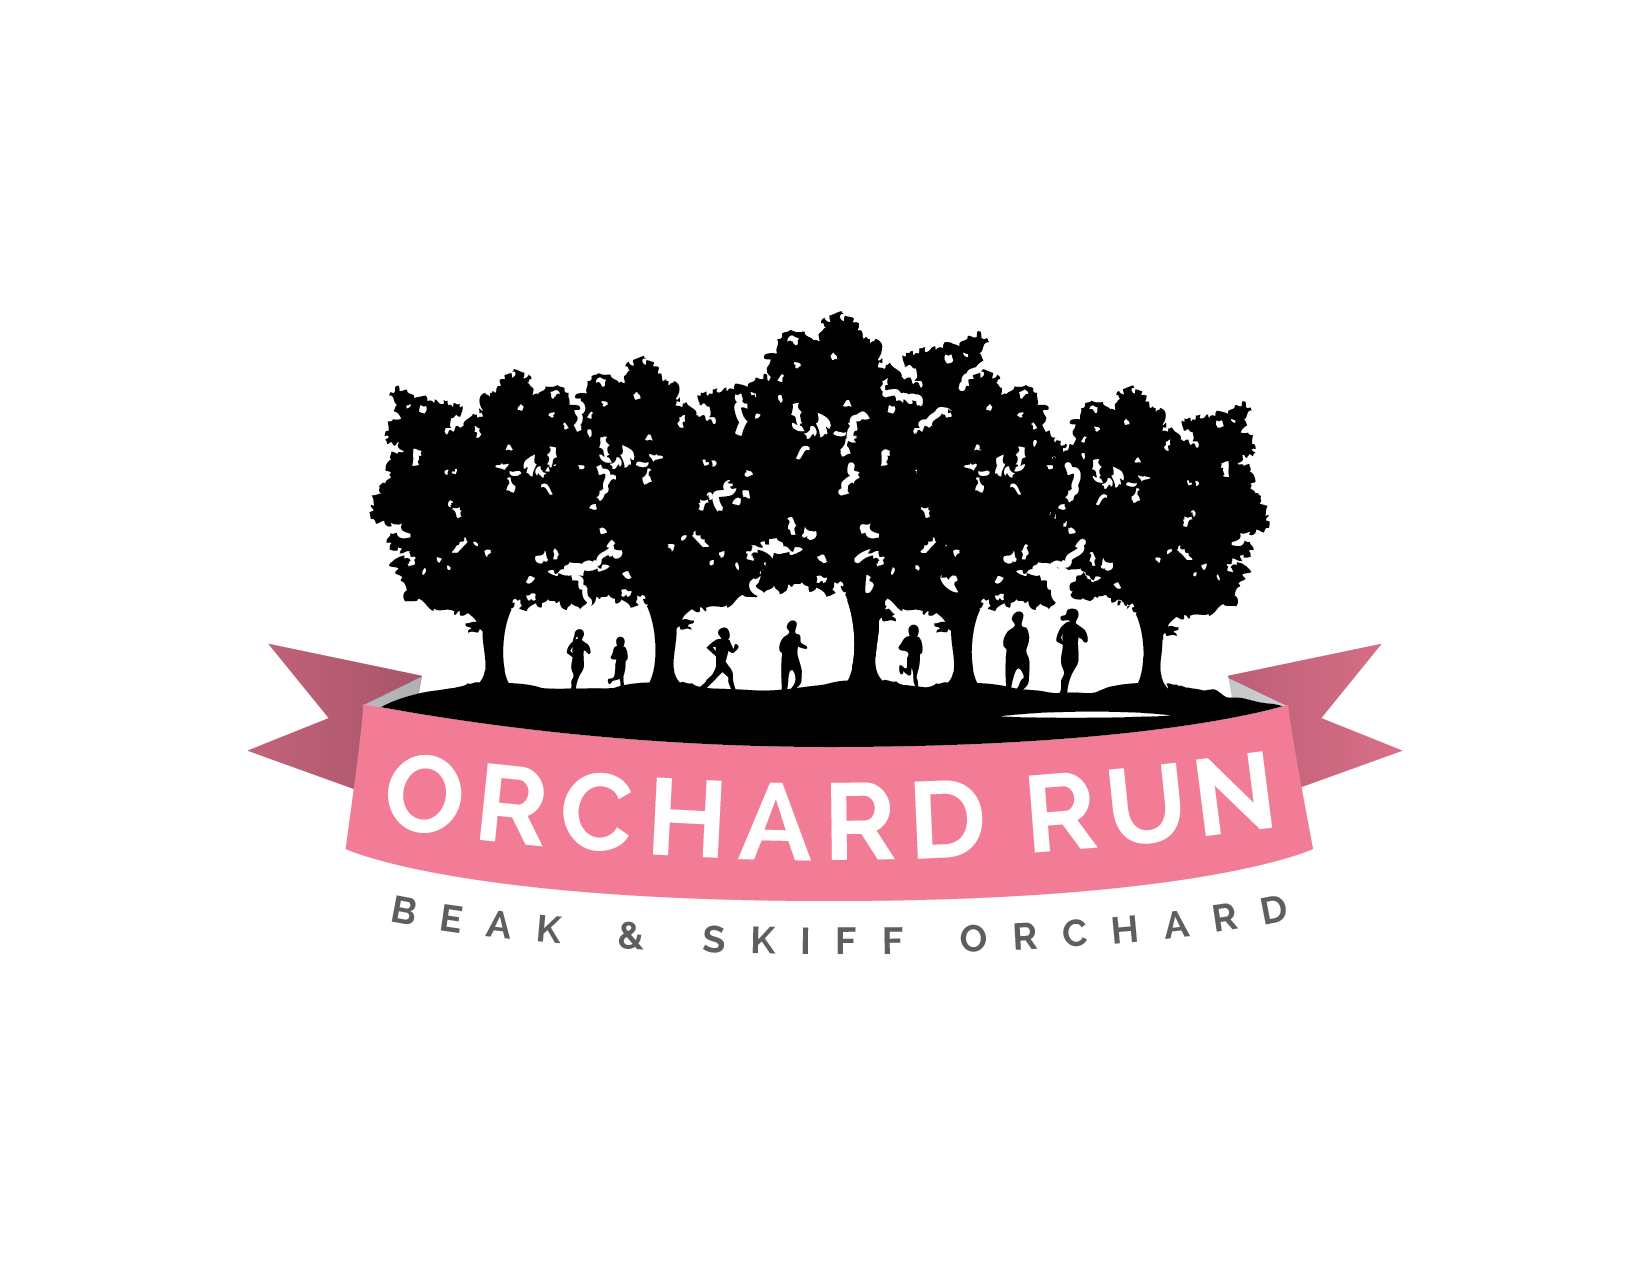 Forth Annual CNY Orchard Run